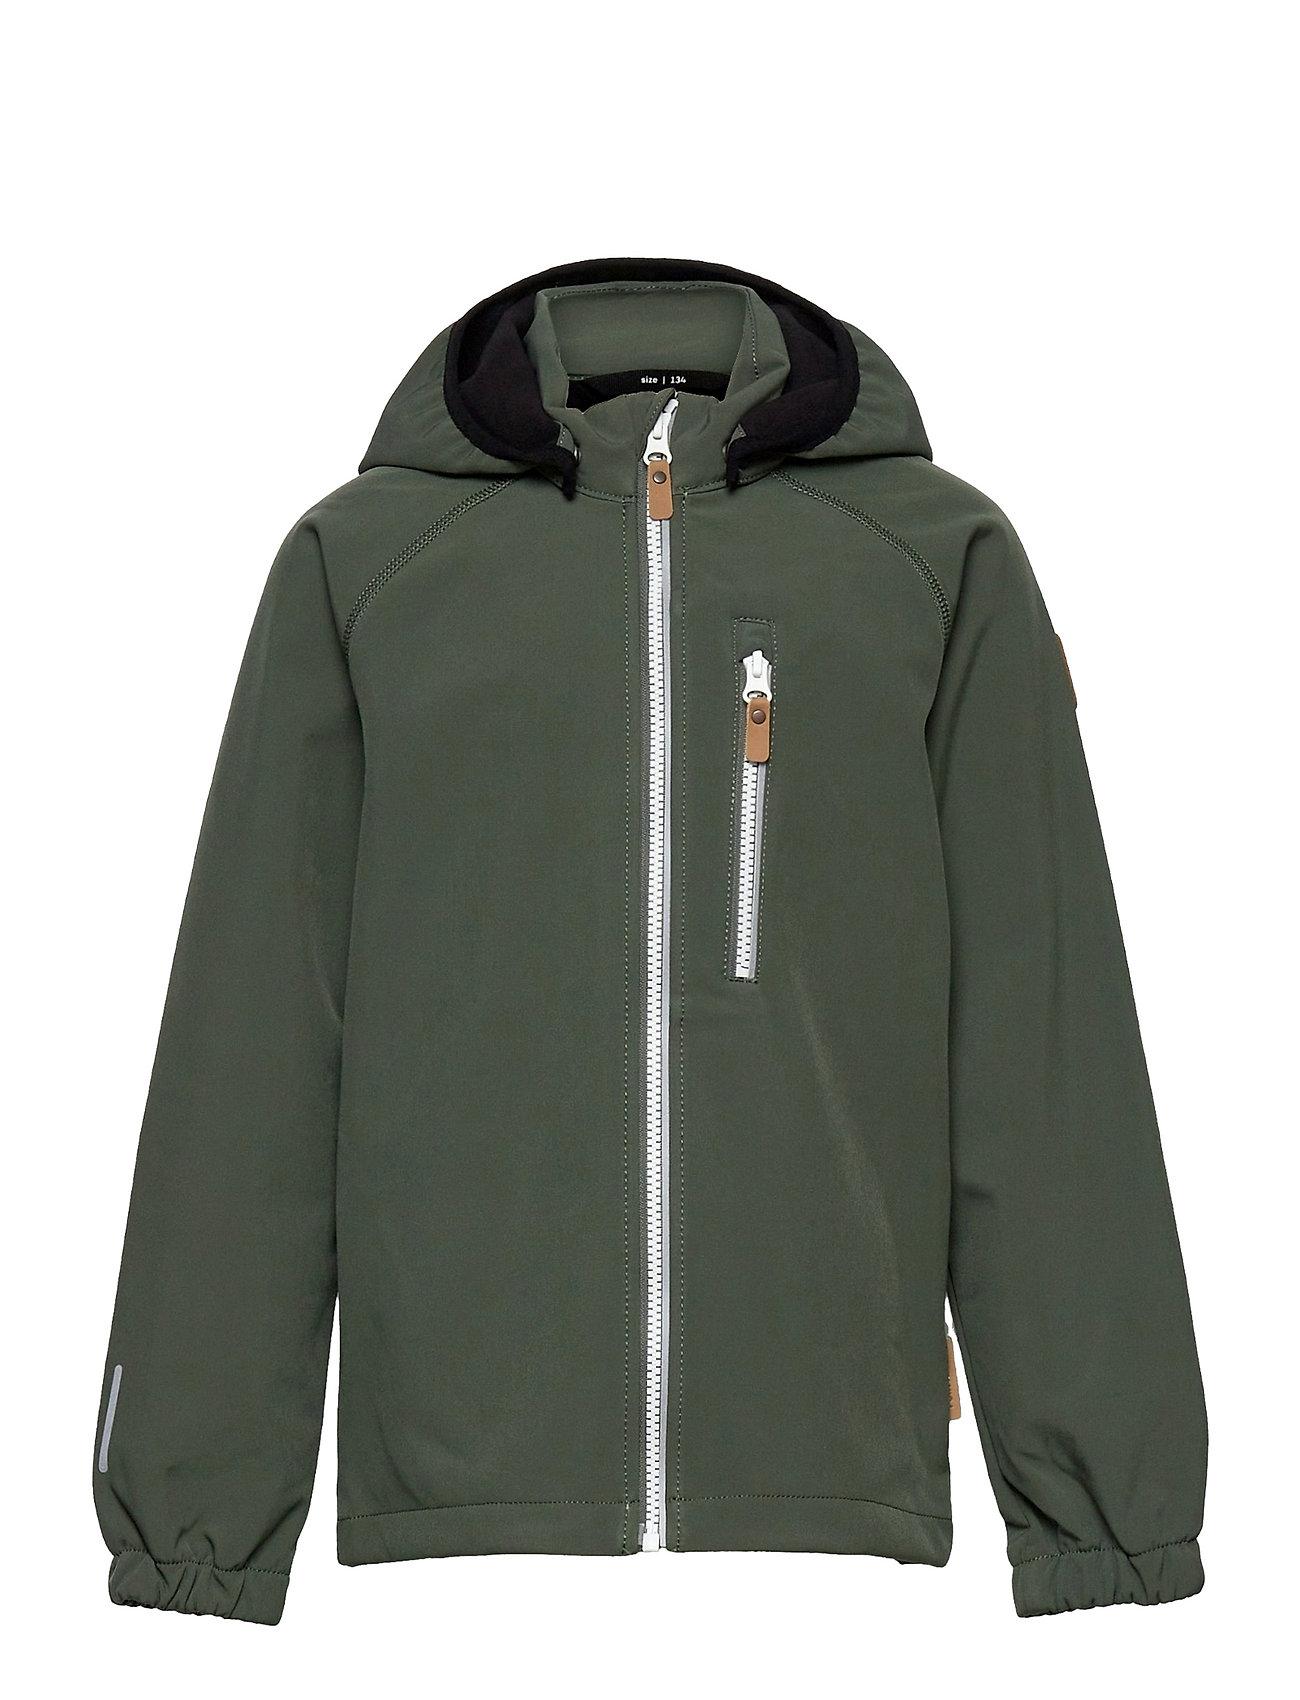 Vantti Outerwear Softshells Softshell Jackets Grøn Reima